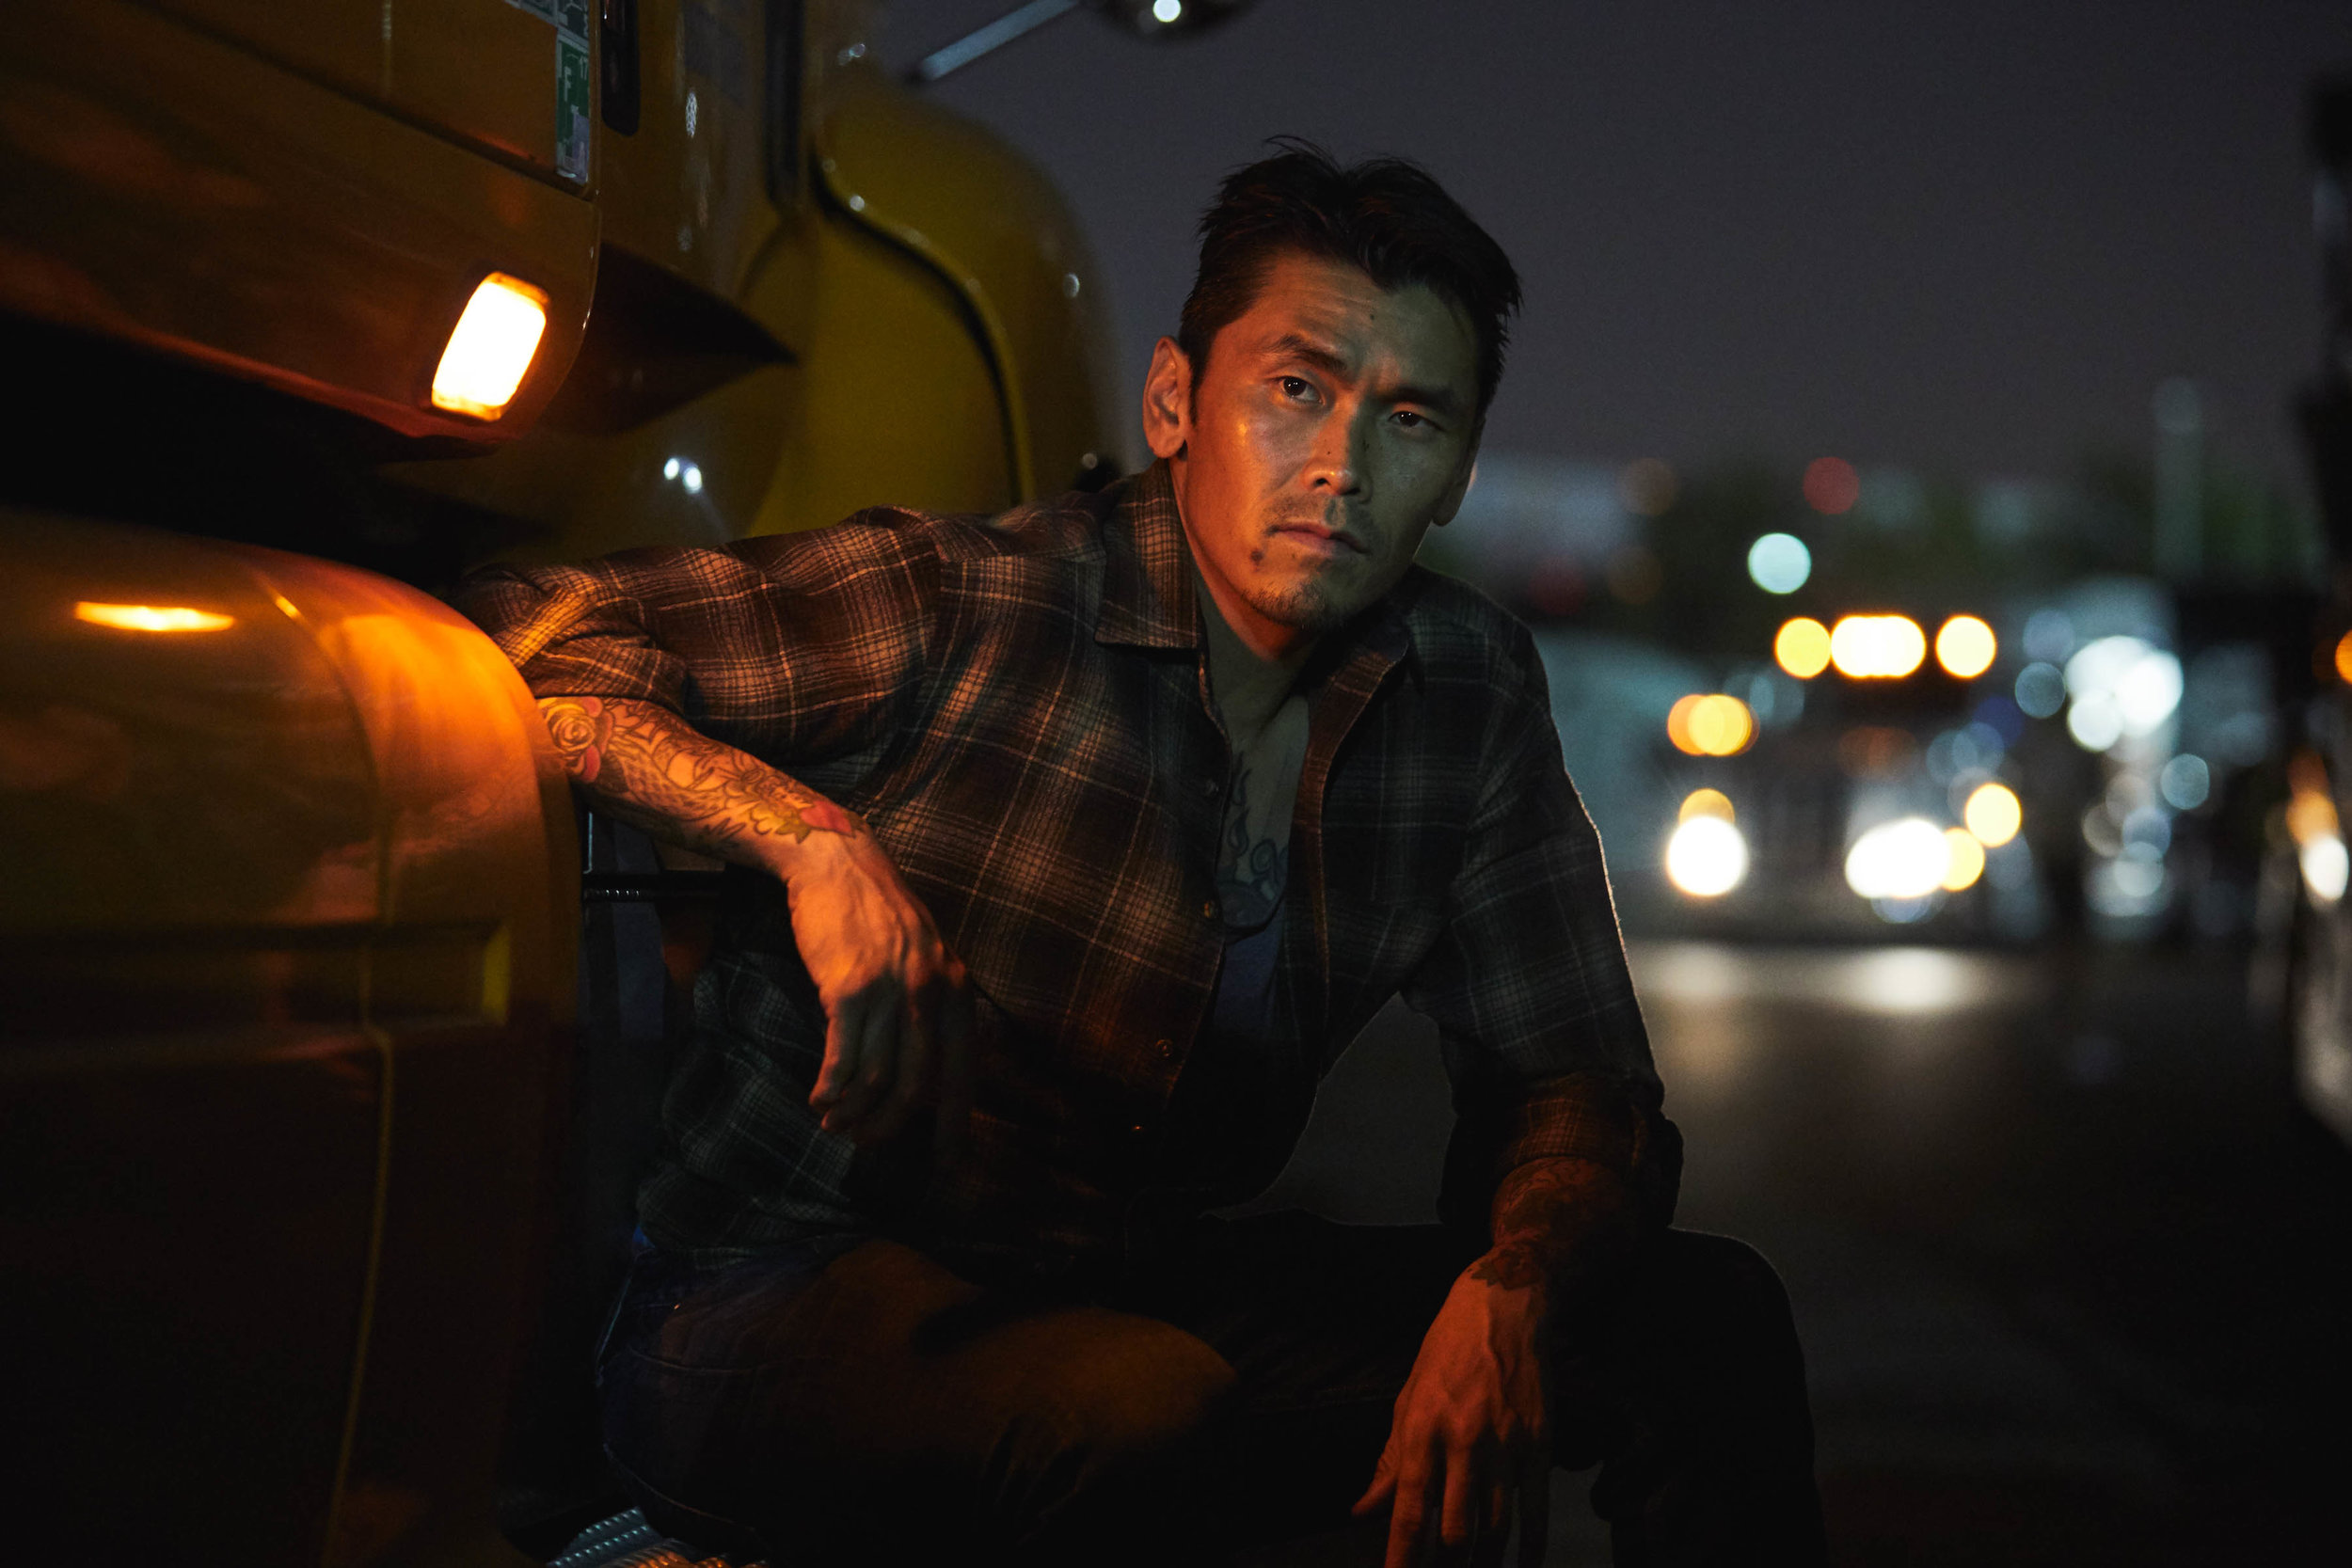 UF_Portrait_Daniel_Night-0019.jpg